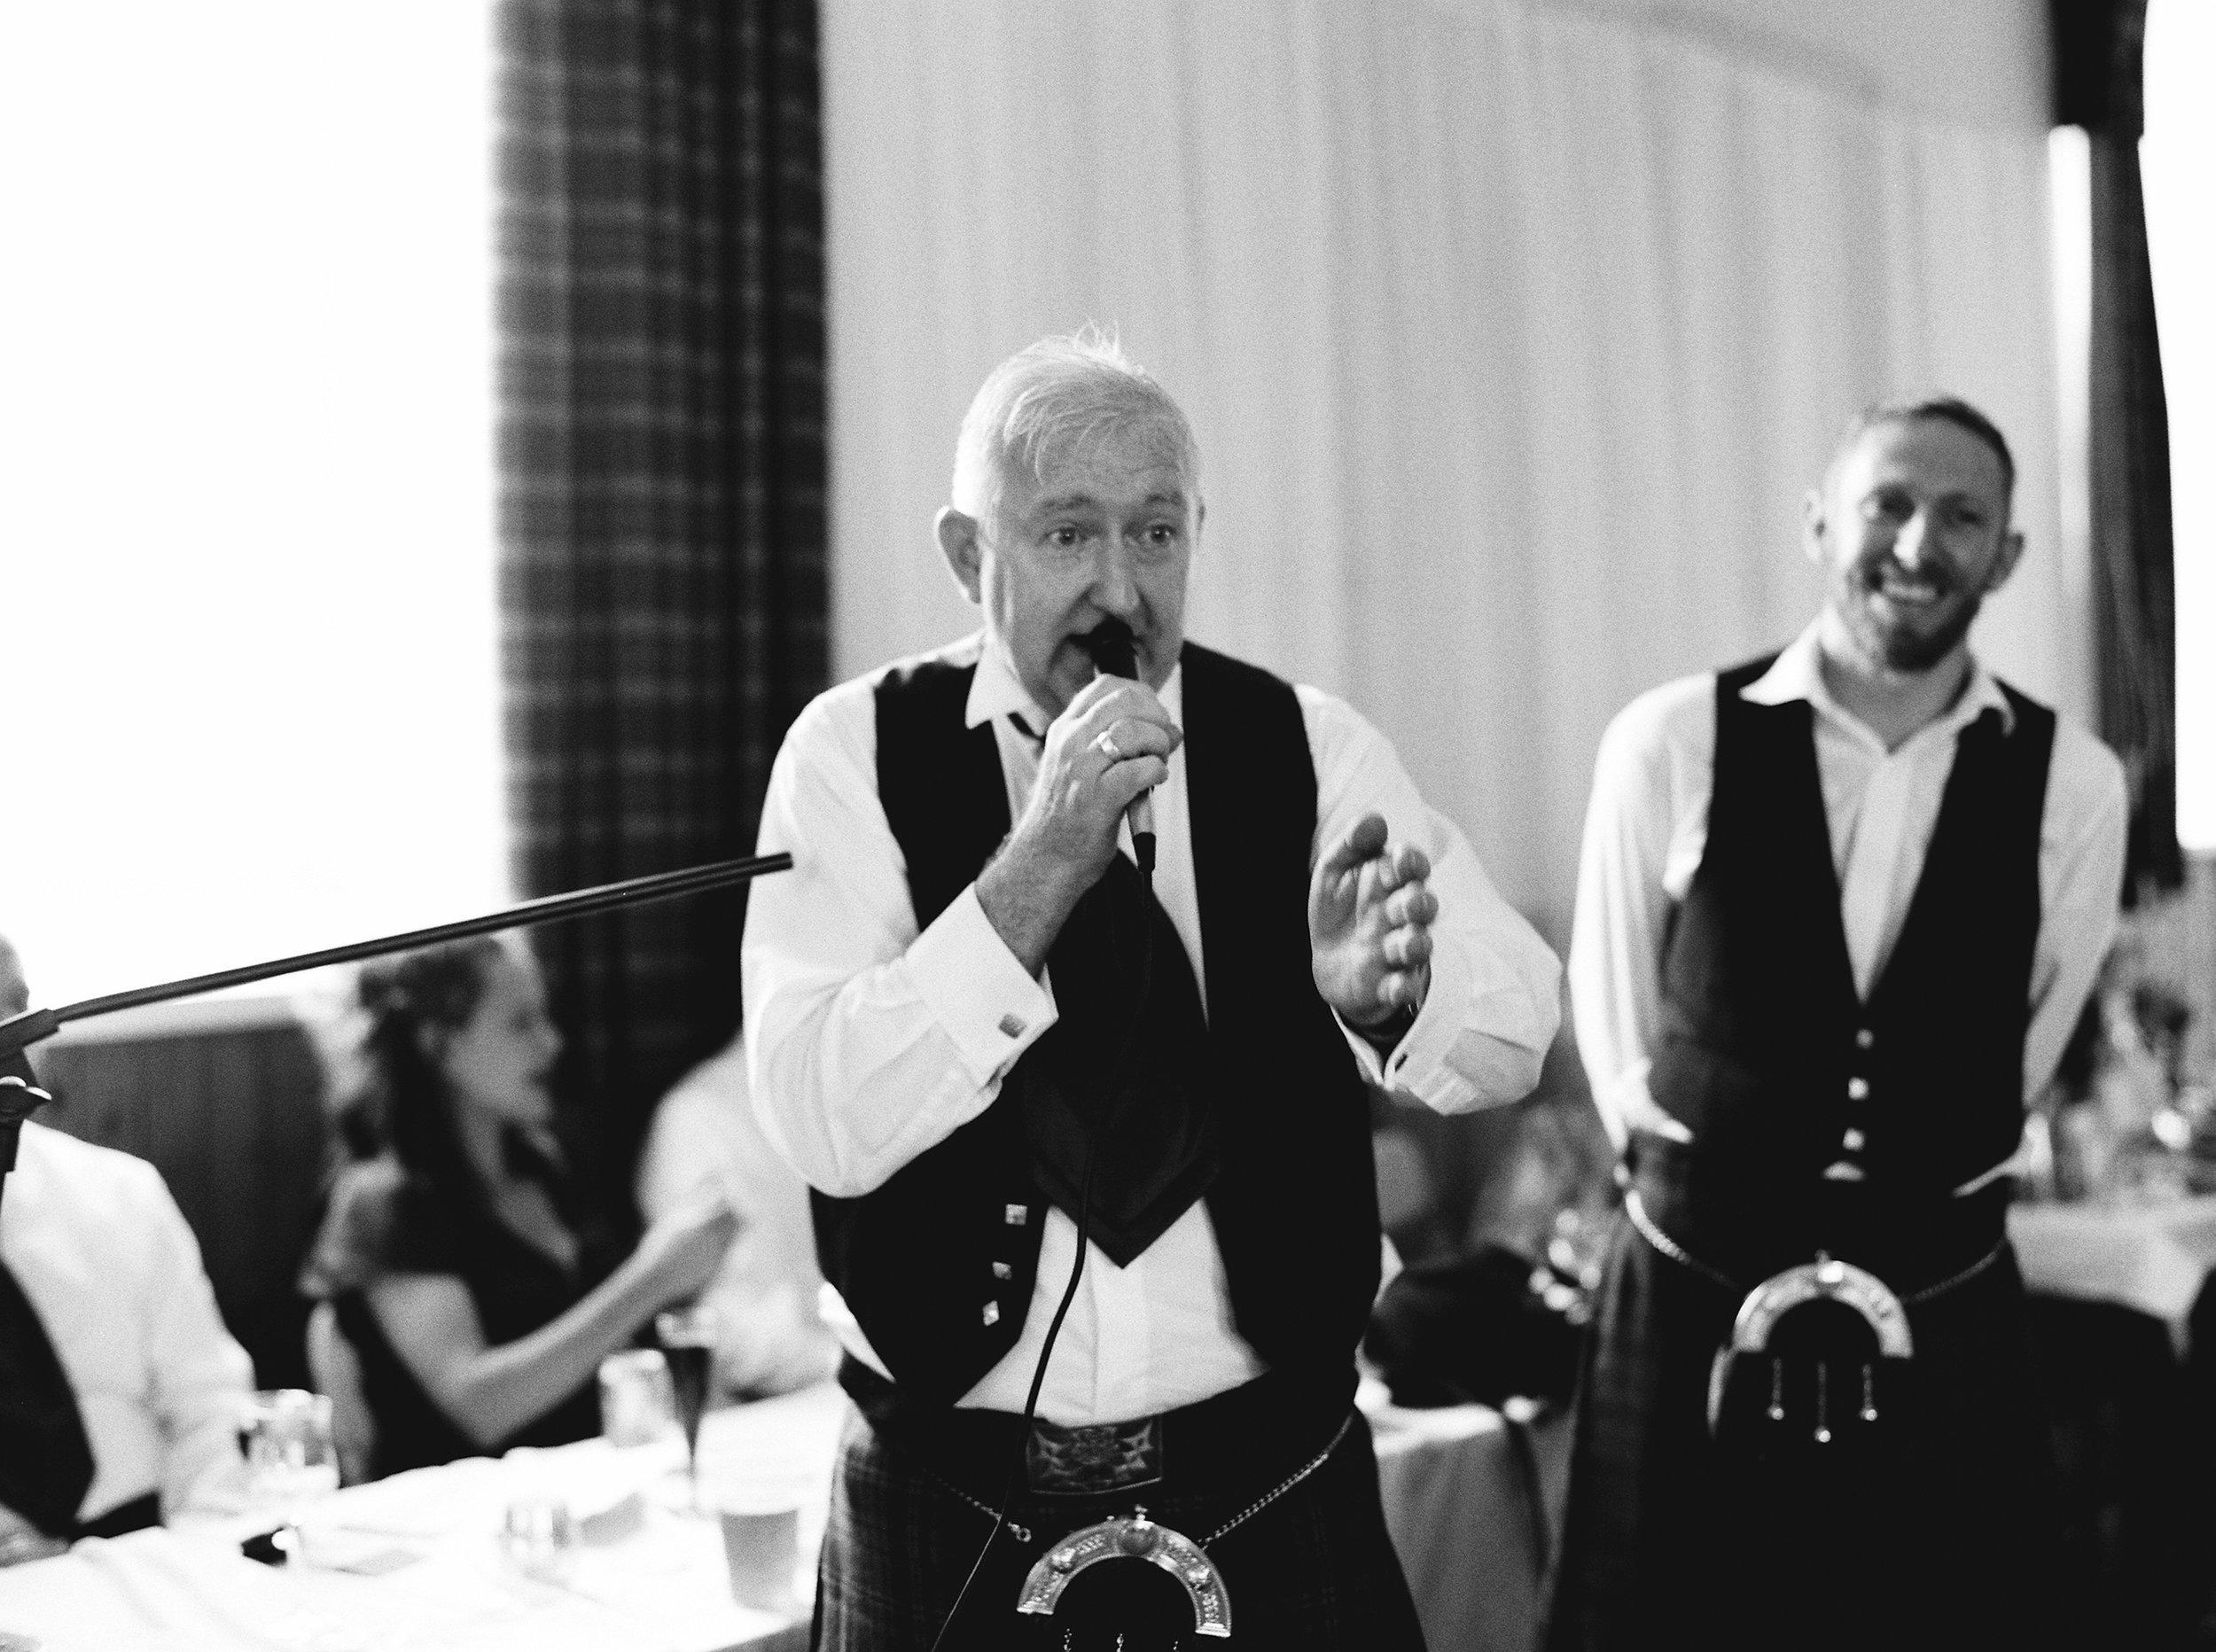 wedding-photography-scotland197.jpg